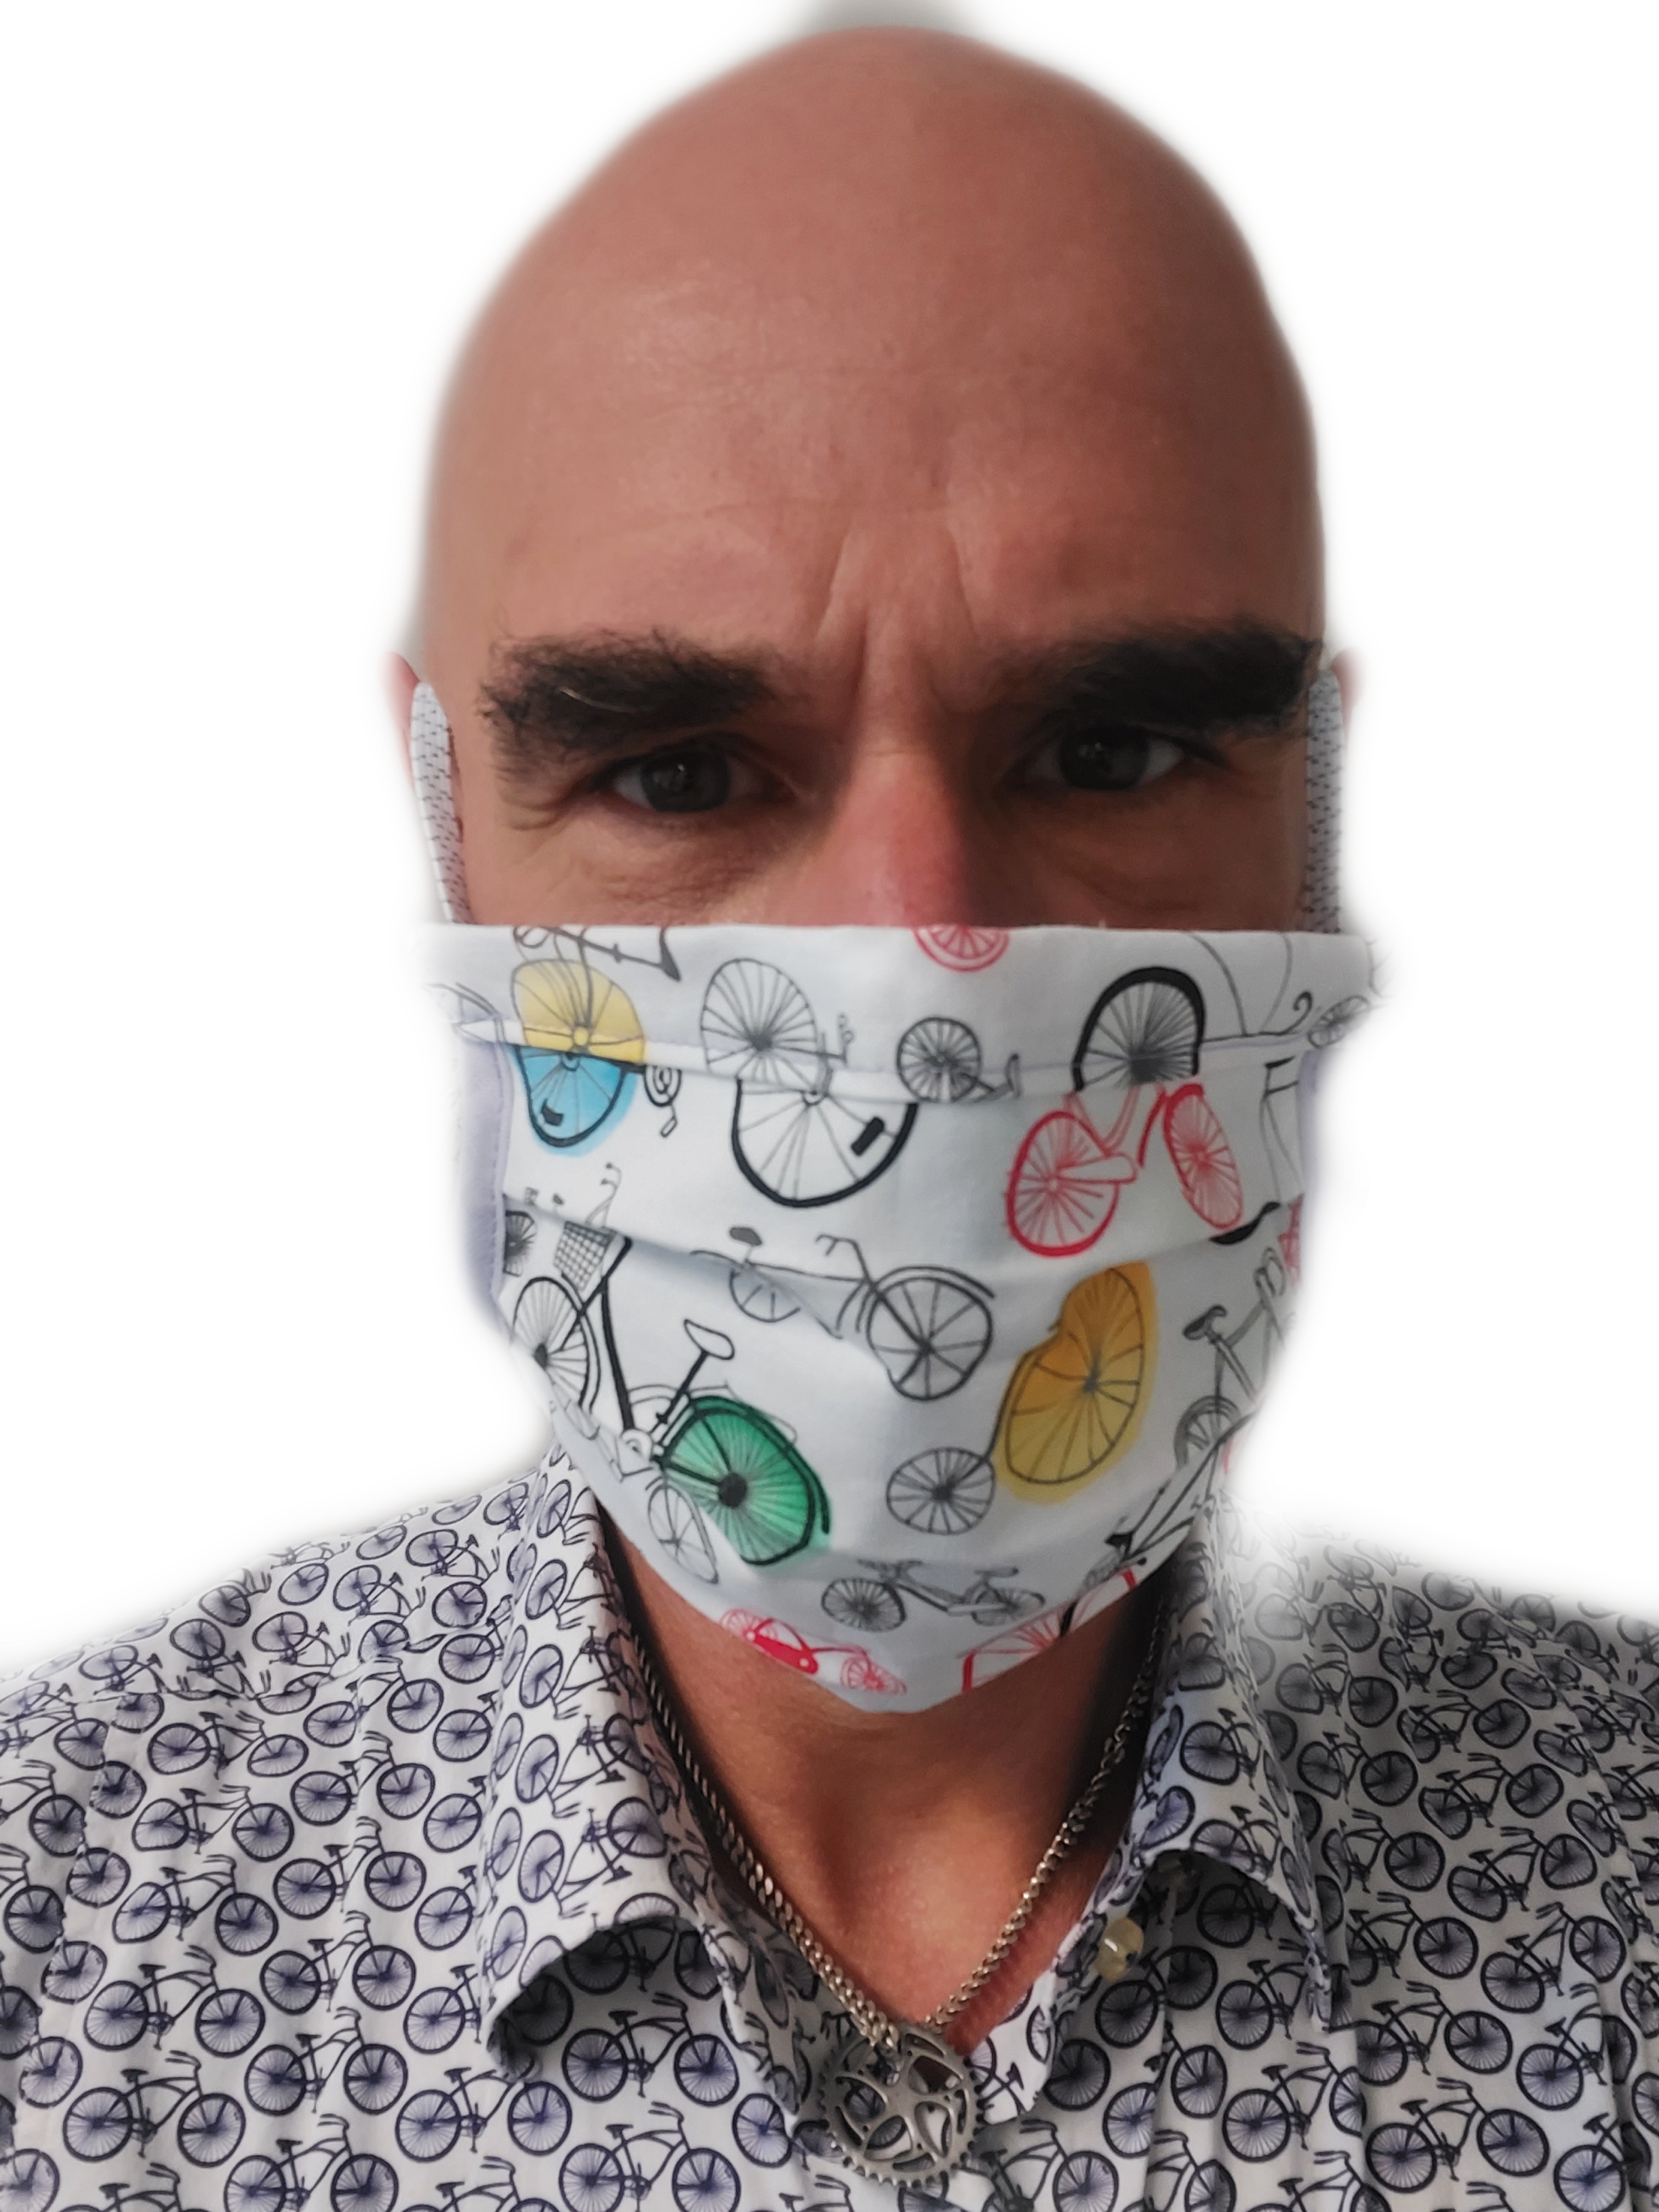 Corona, Virus, COVID, Covid 19, SARS, Mund- Nasenbedeckung, AHA, Abstand, Hygiene, Schutz, Pandemie,